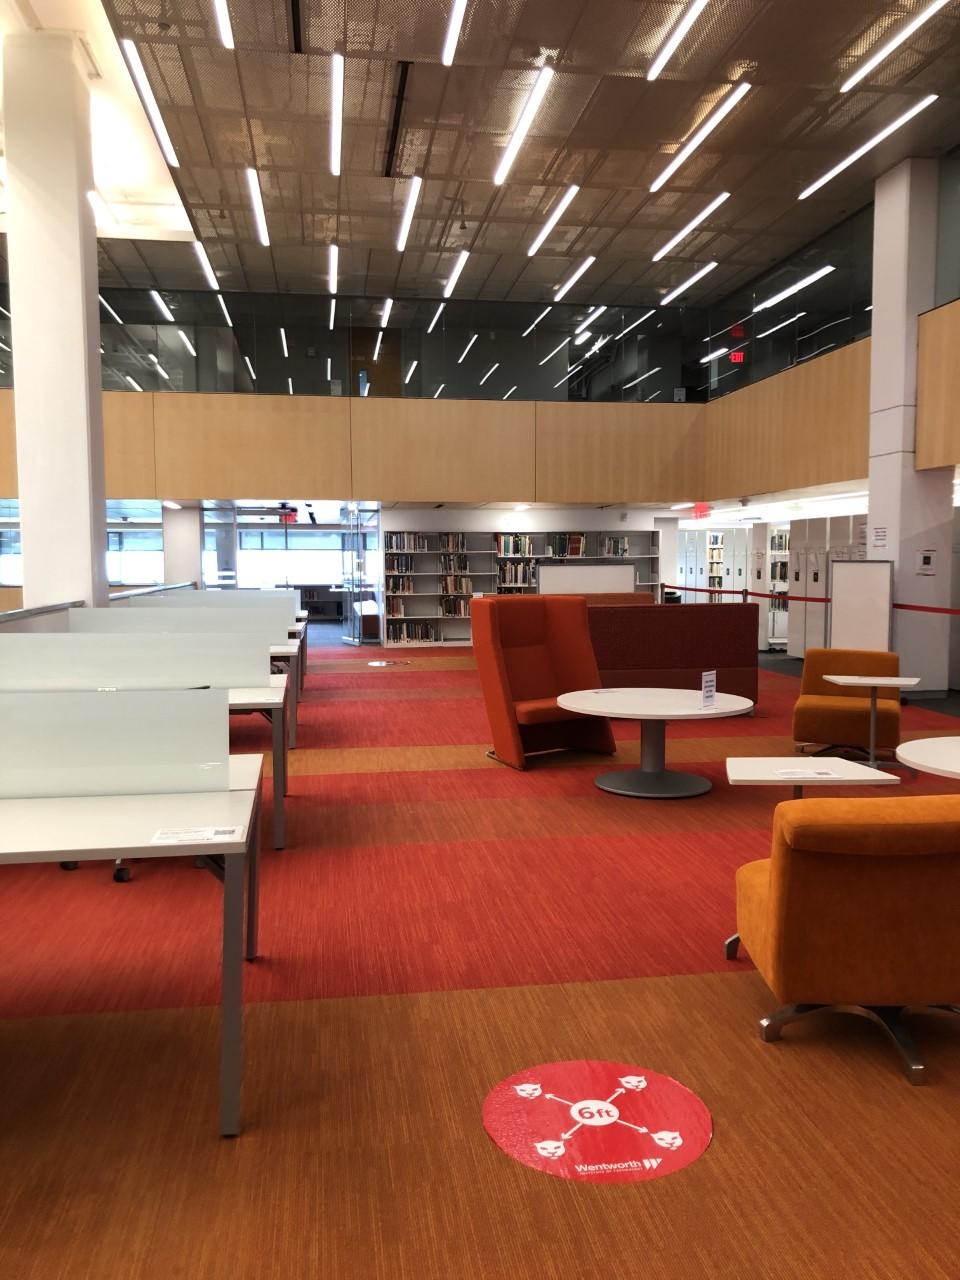 Library space; Mezzanine main area